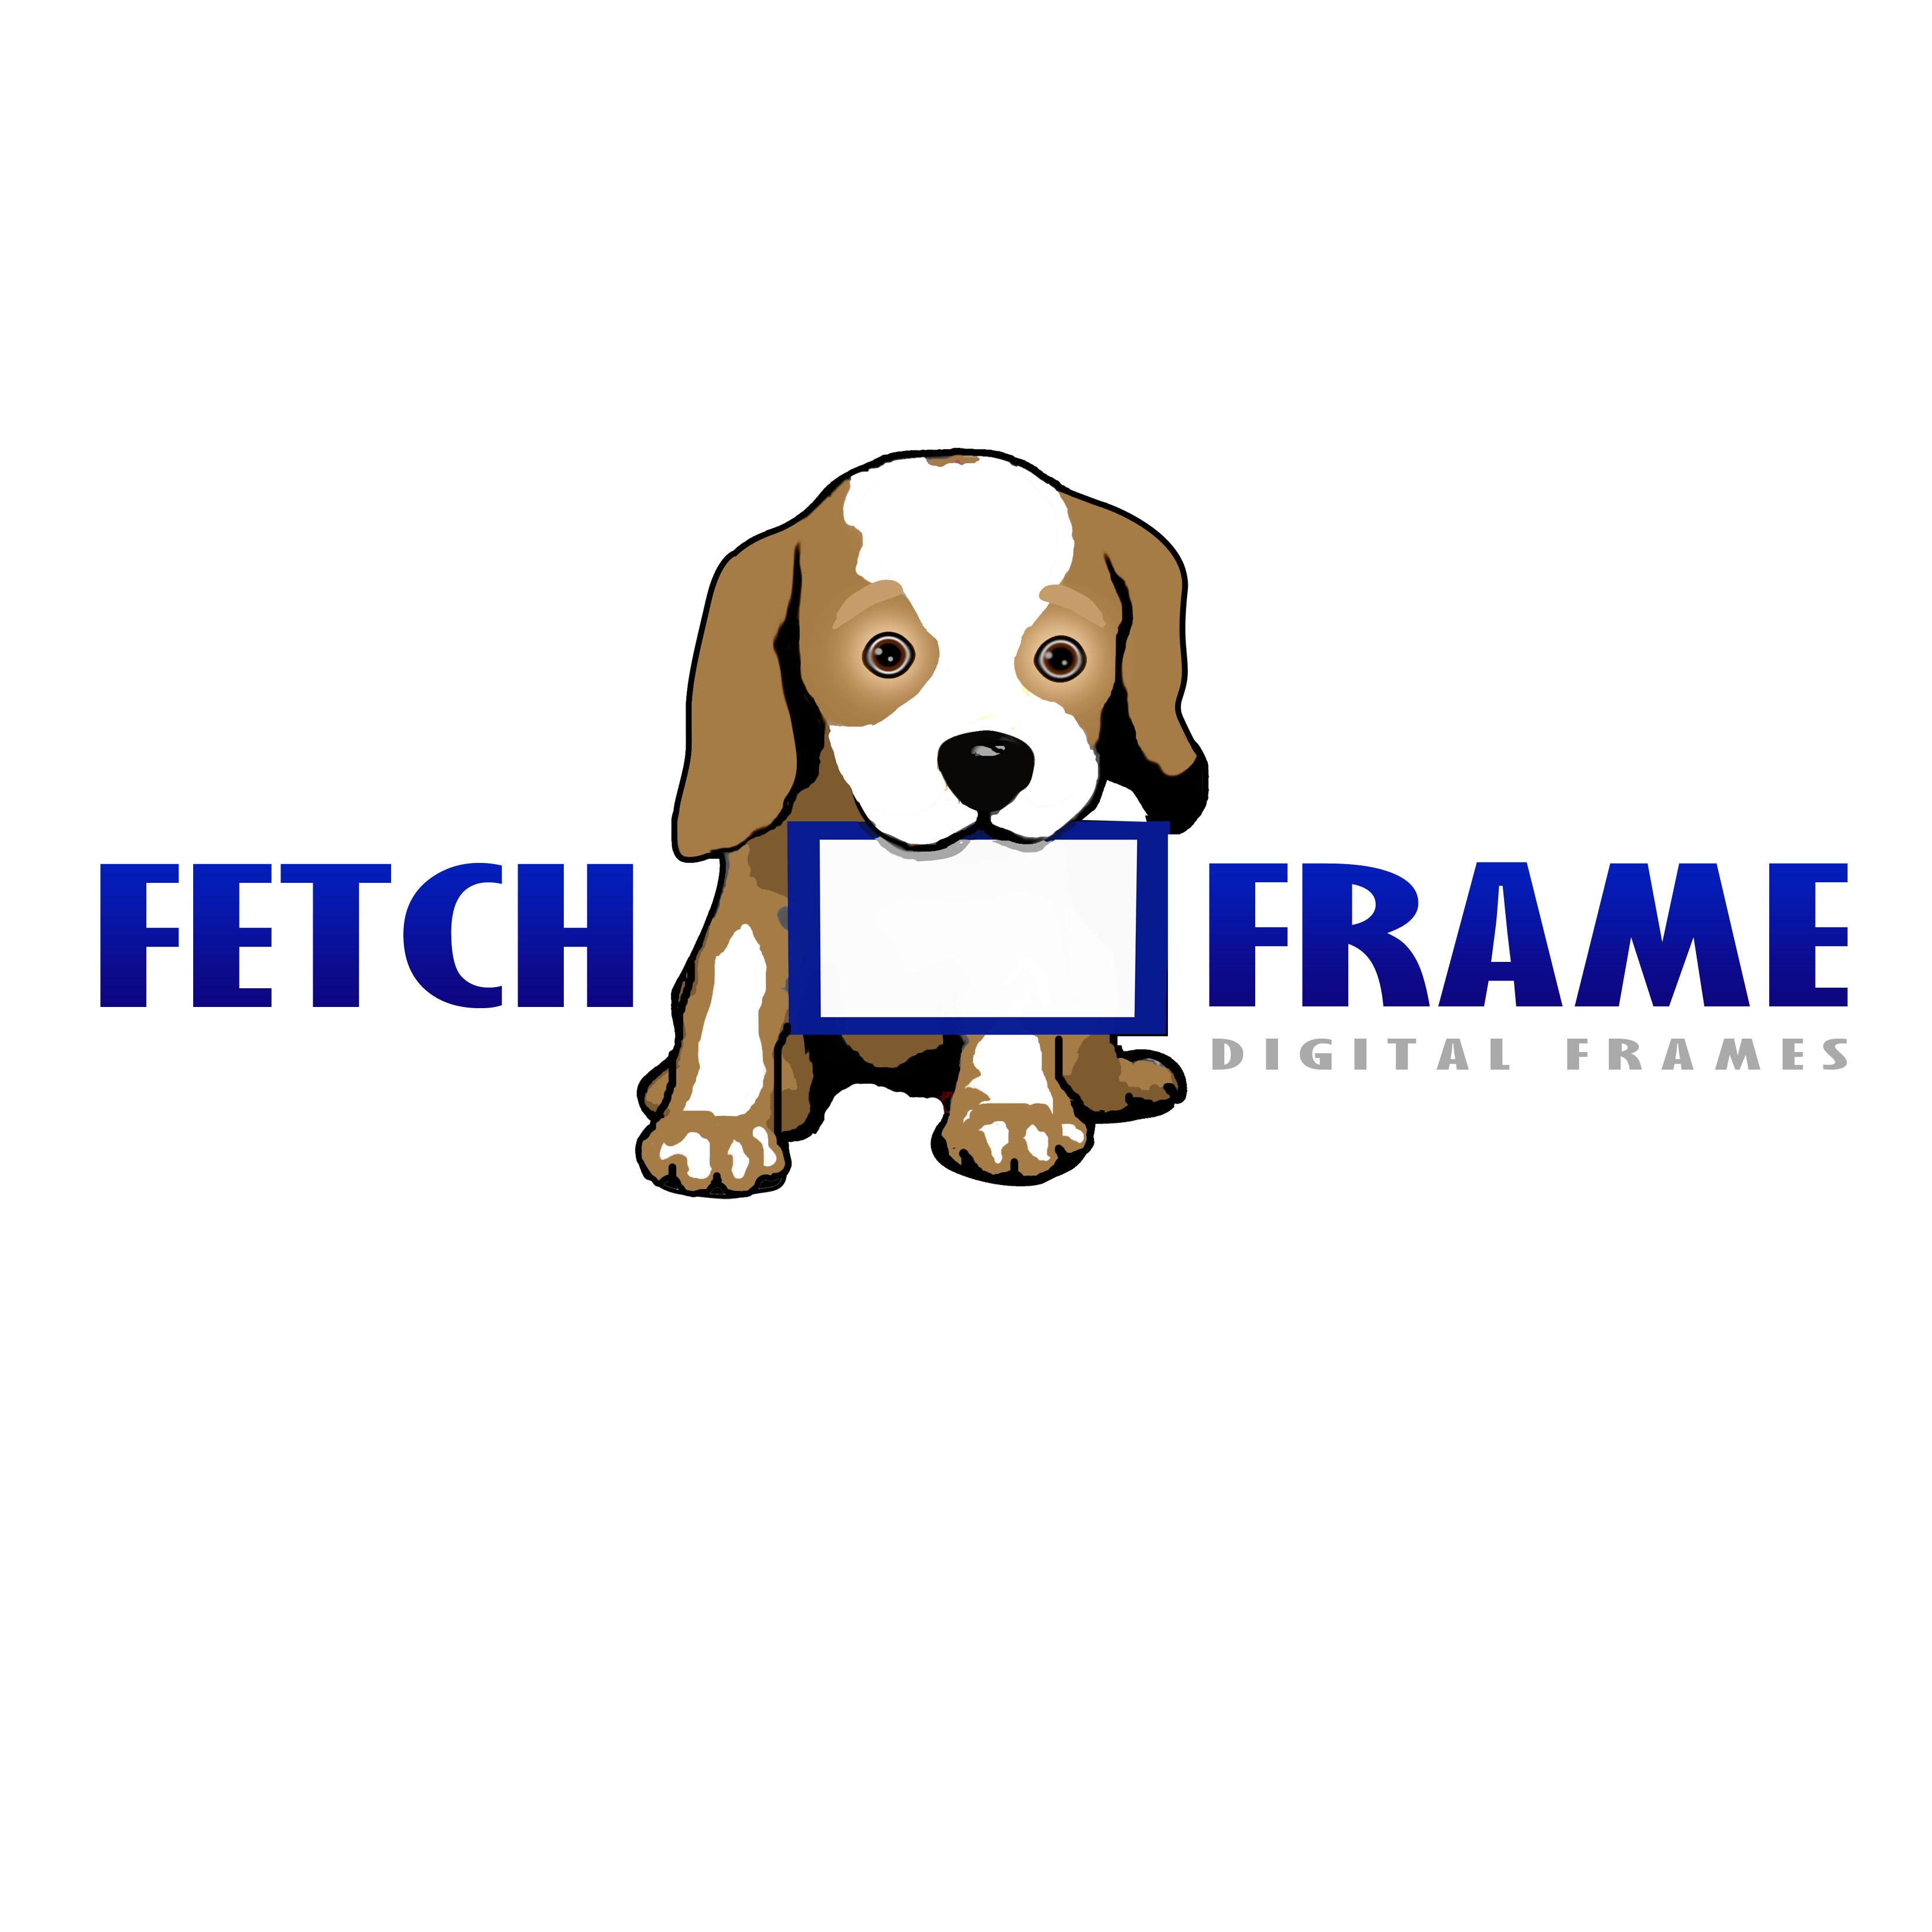 Logo Design by Allan Esclamado - Entry No. 94 in the Logo Design Contest New Logo Design for FetchFrame.